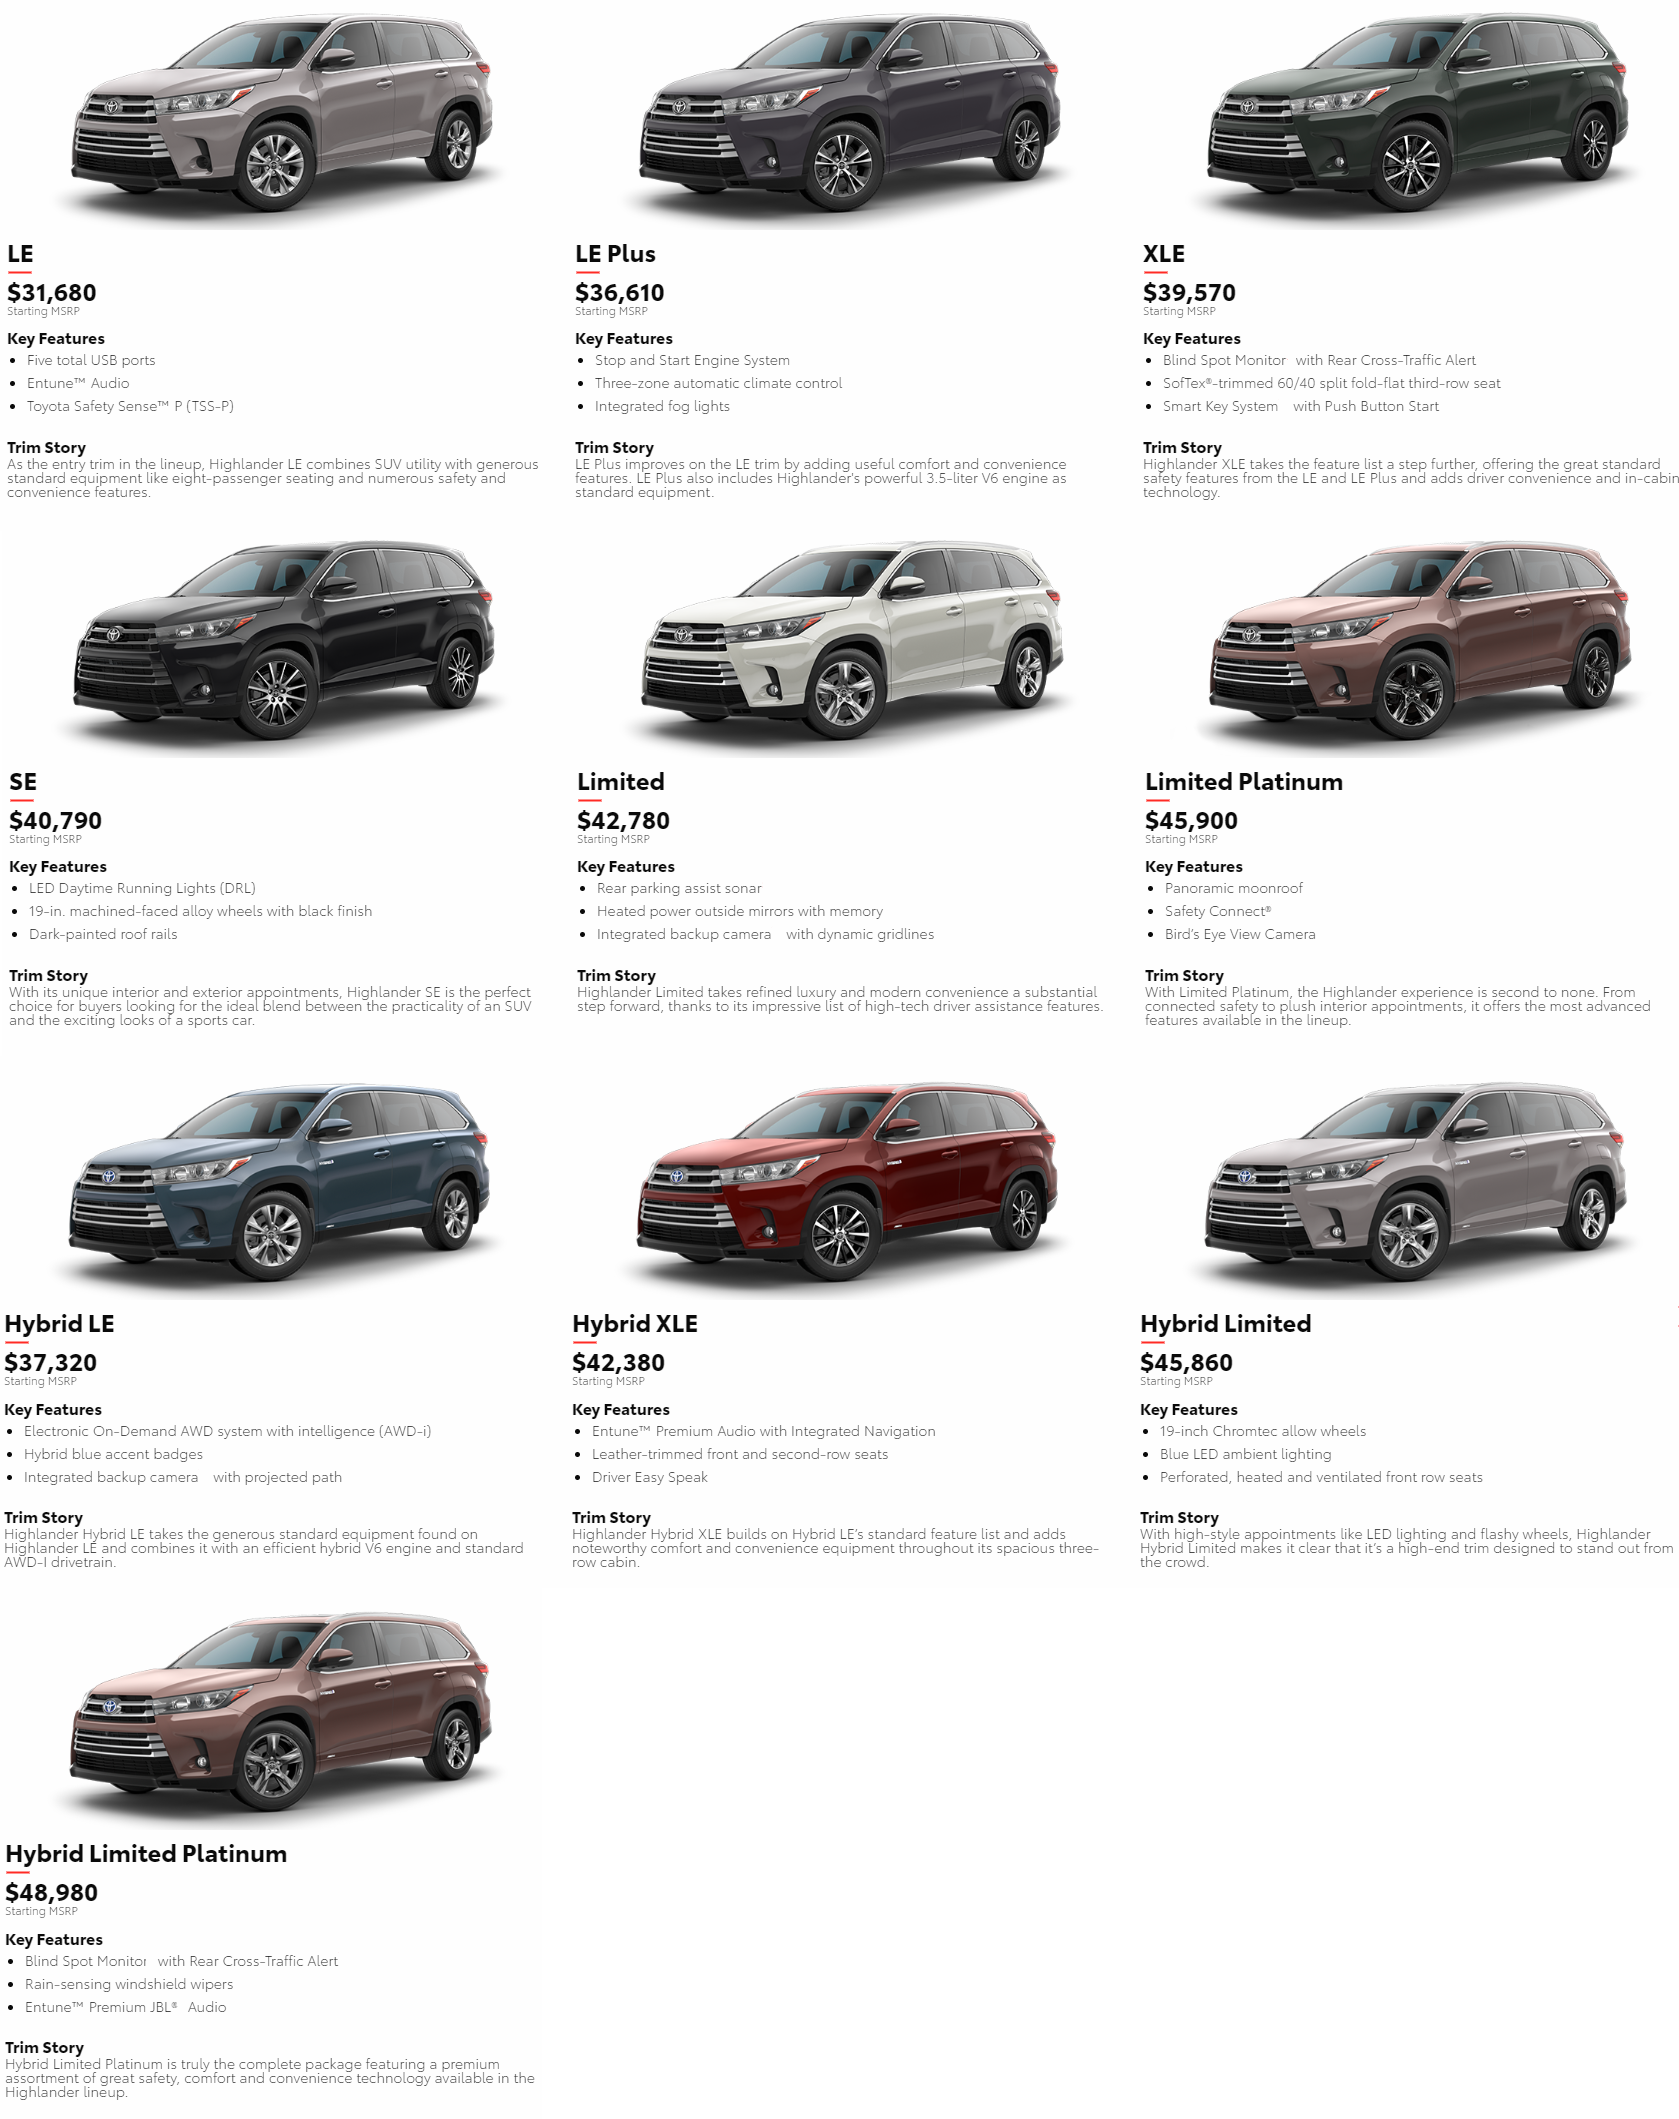 2019 Toyota Highlander Trim Level Guide